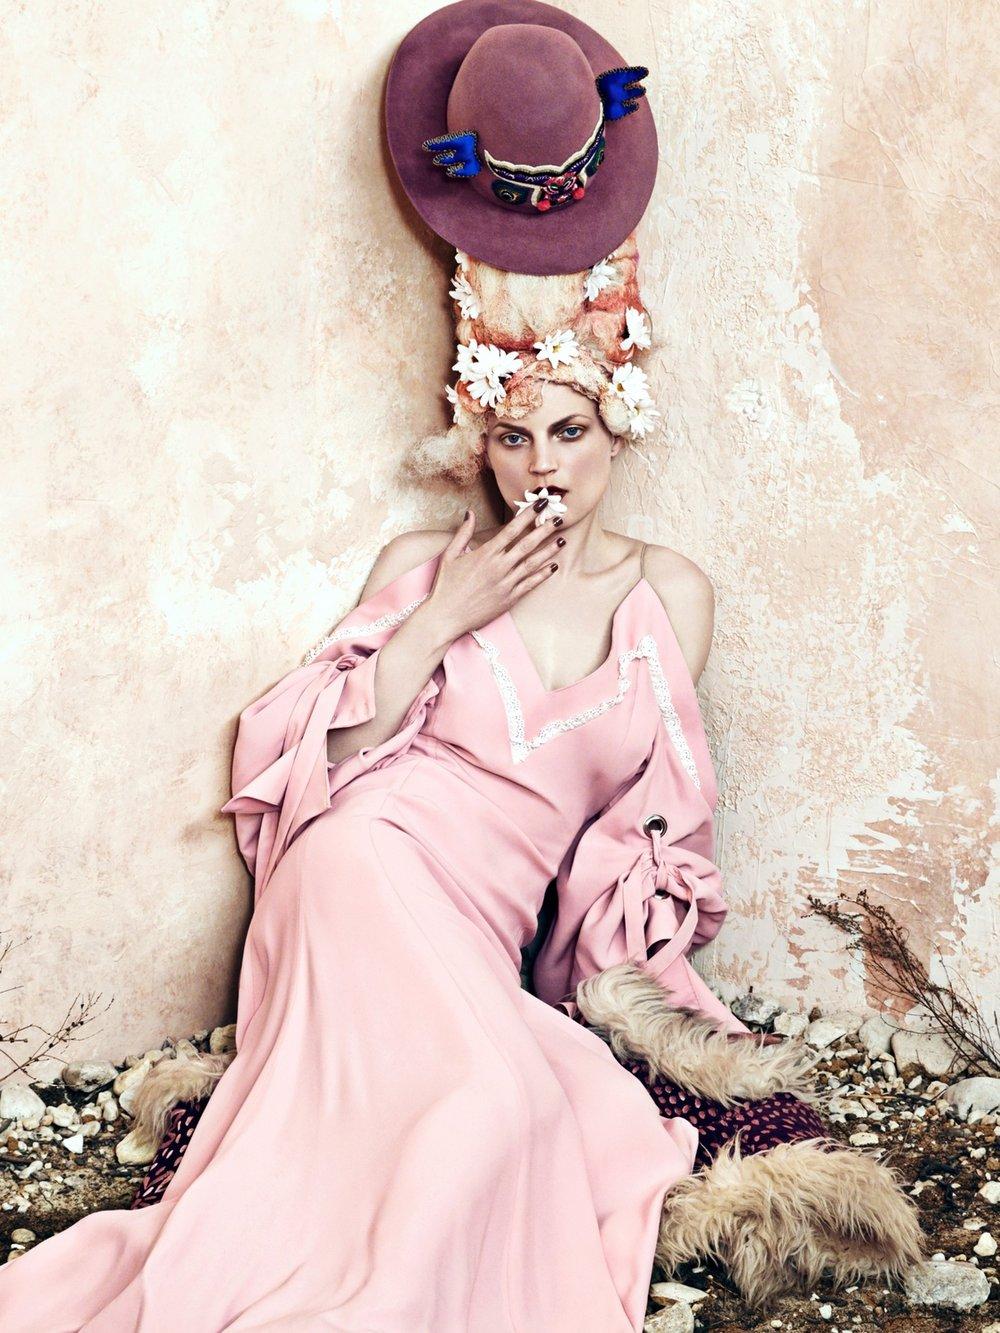 cr-fashion-book-no9-fall-winter-2016-guinevere-van-seenus-by-bjorn-iooss-03.jpg